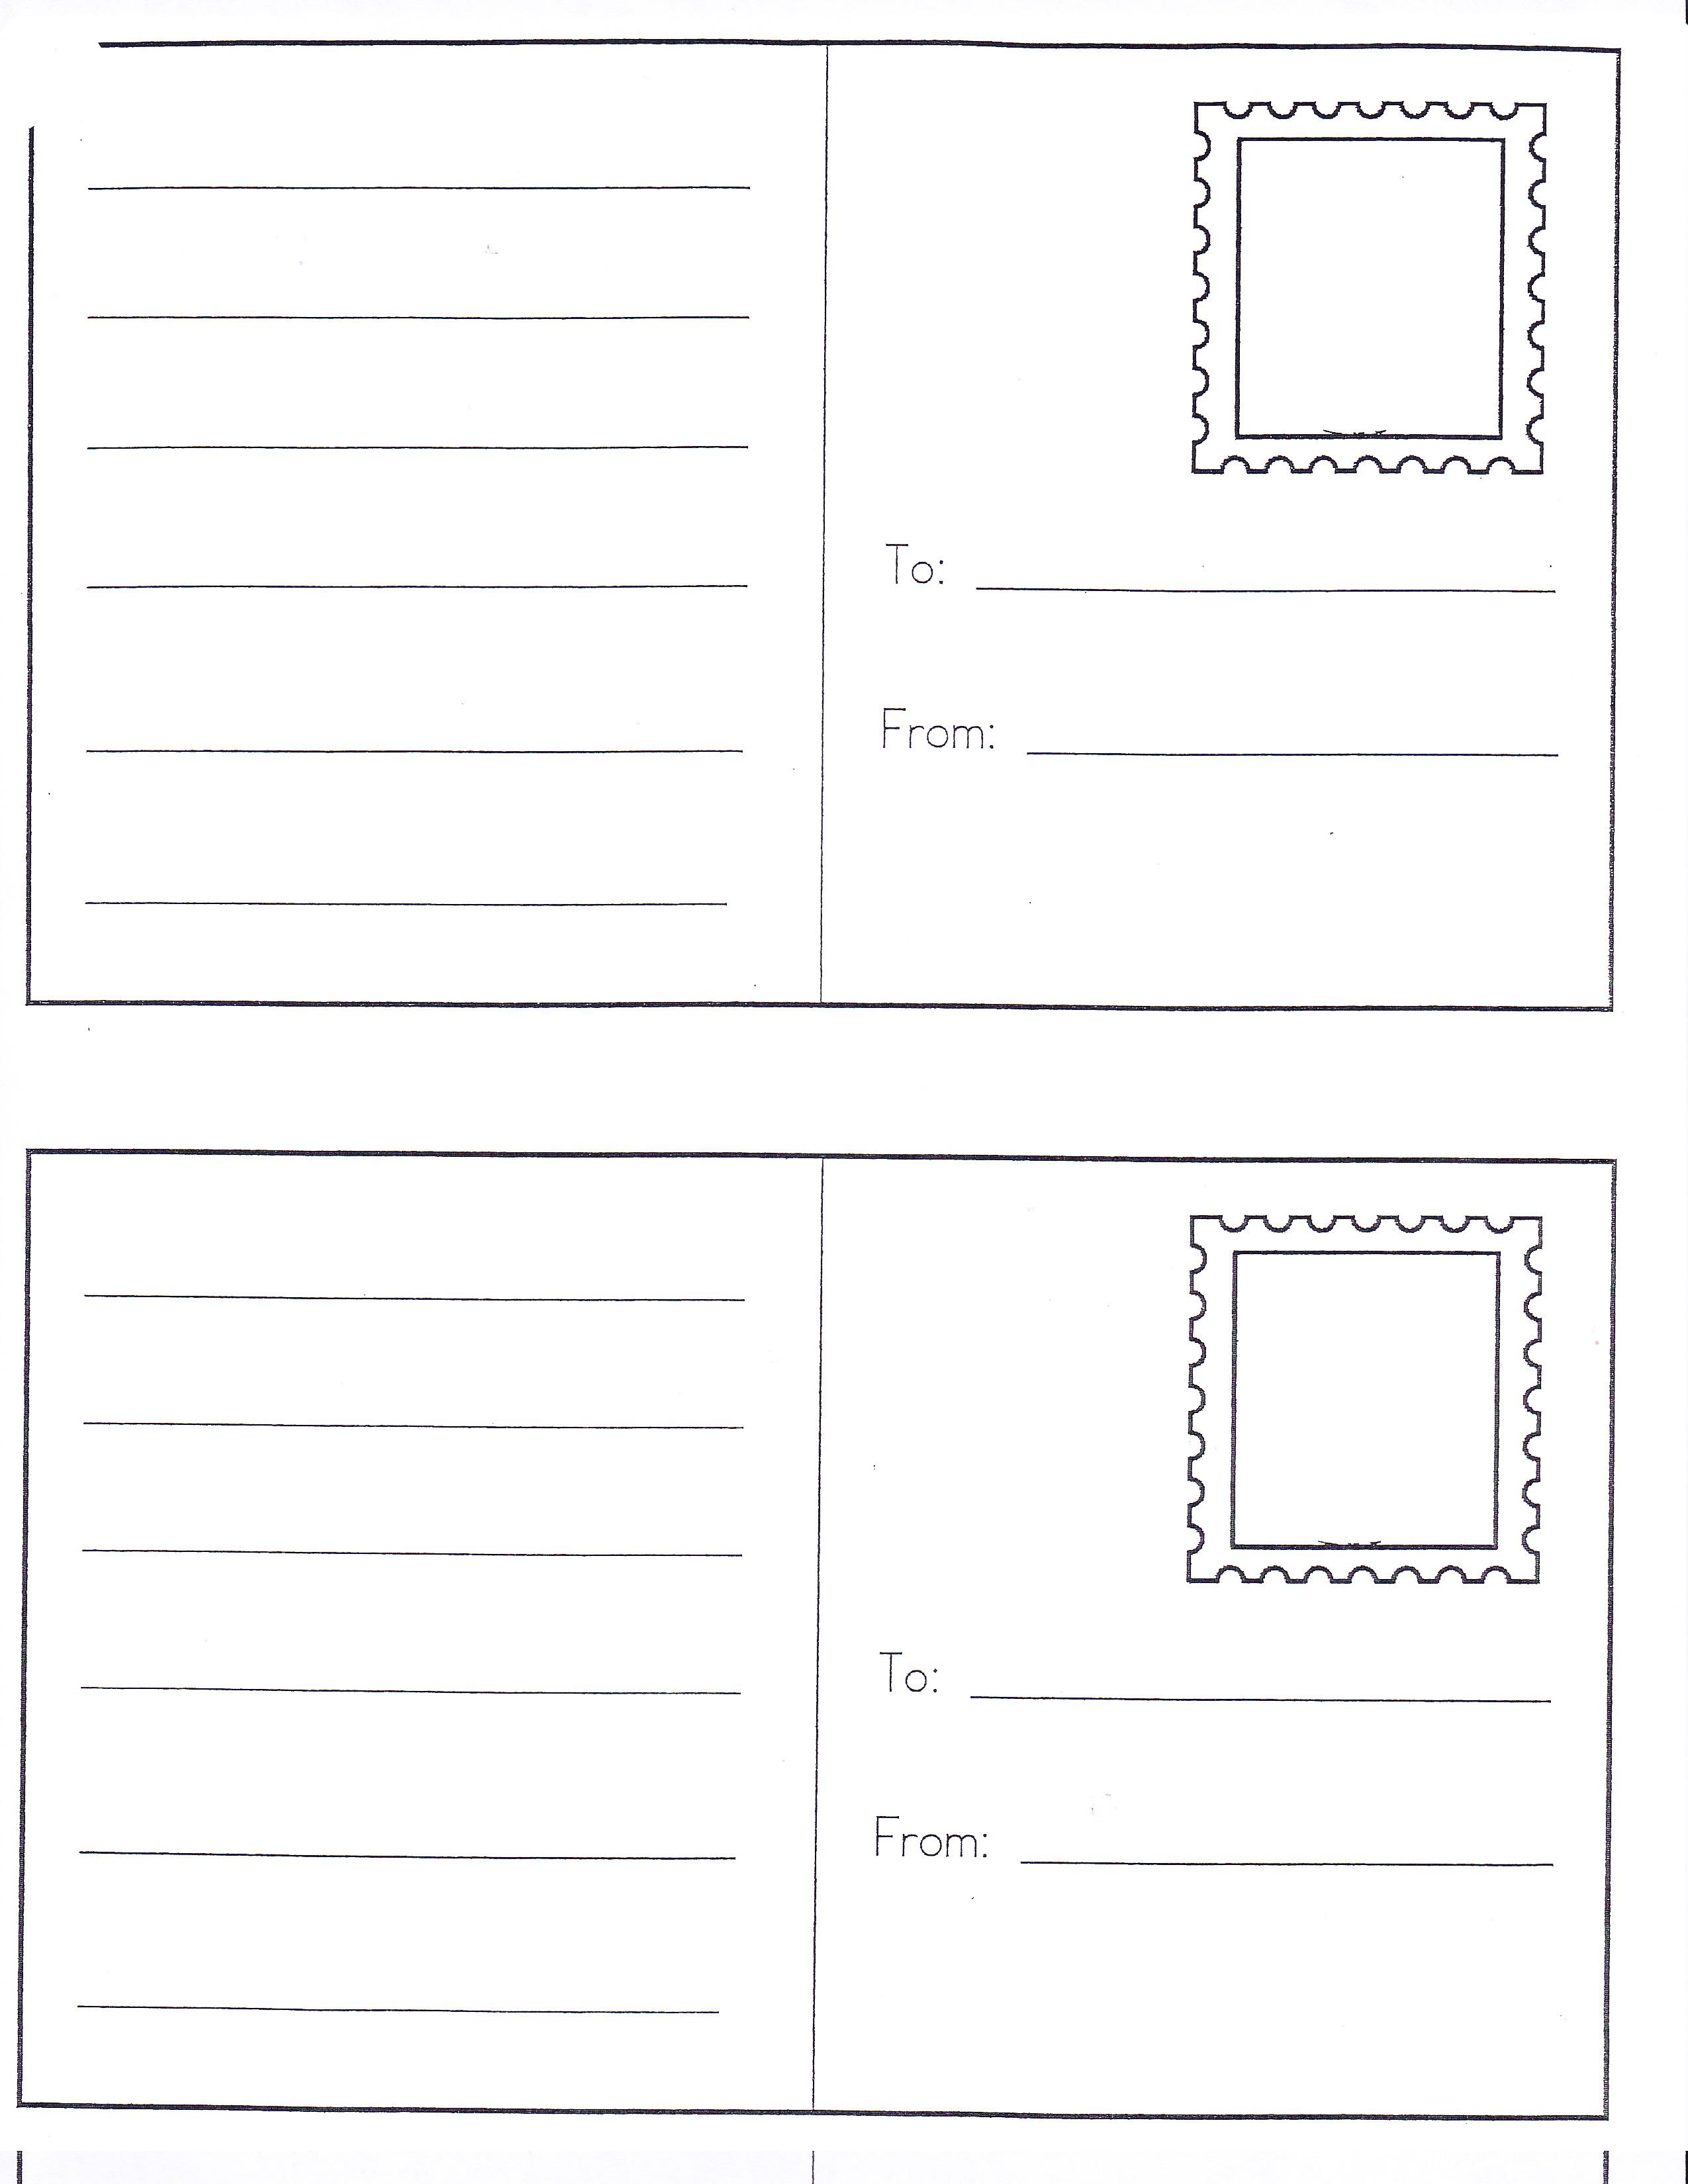 8 Best Images Of Preschool Post Office Stamps Printables